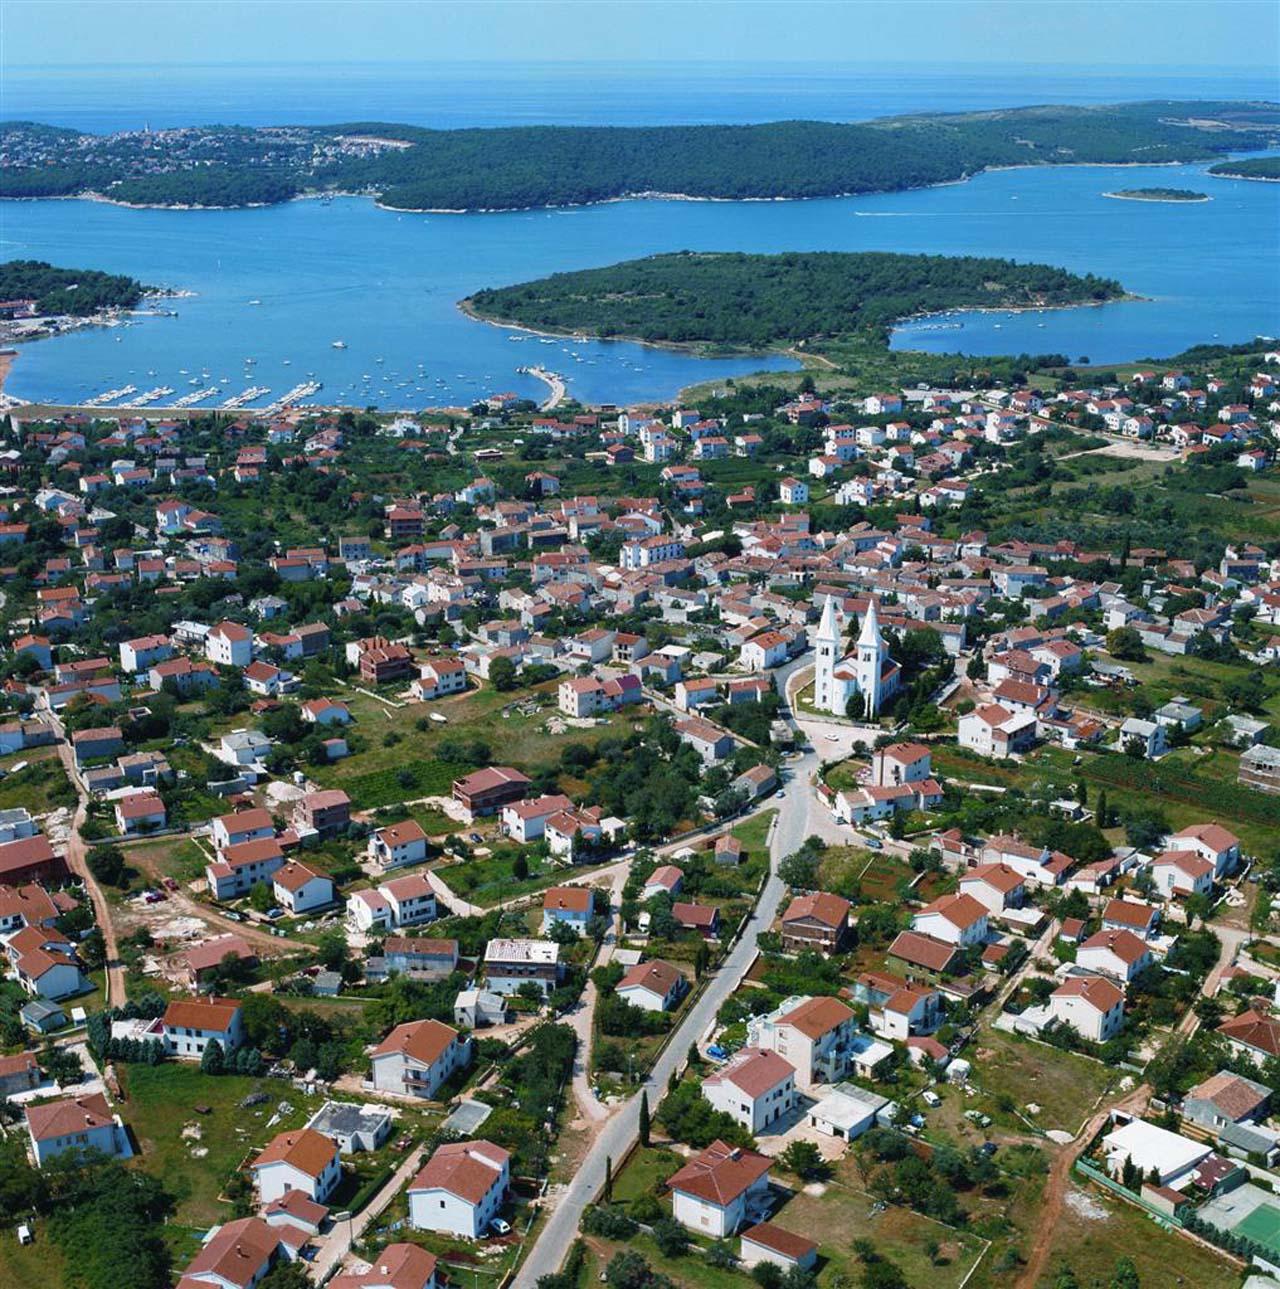 медулин хорватия фото красивые имена мусульман